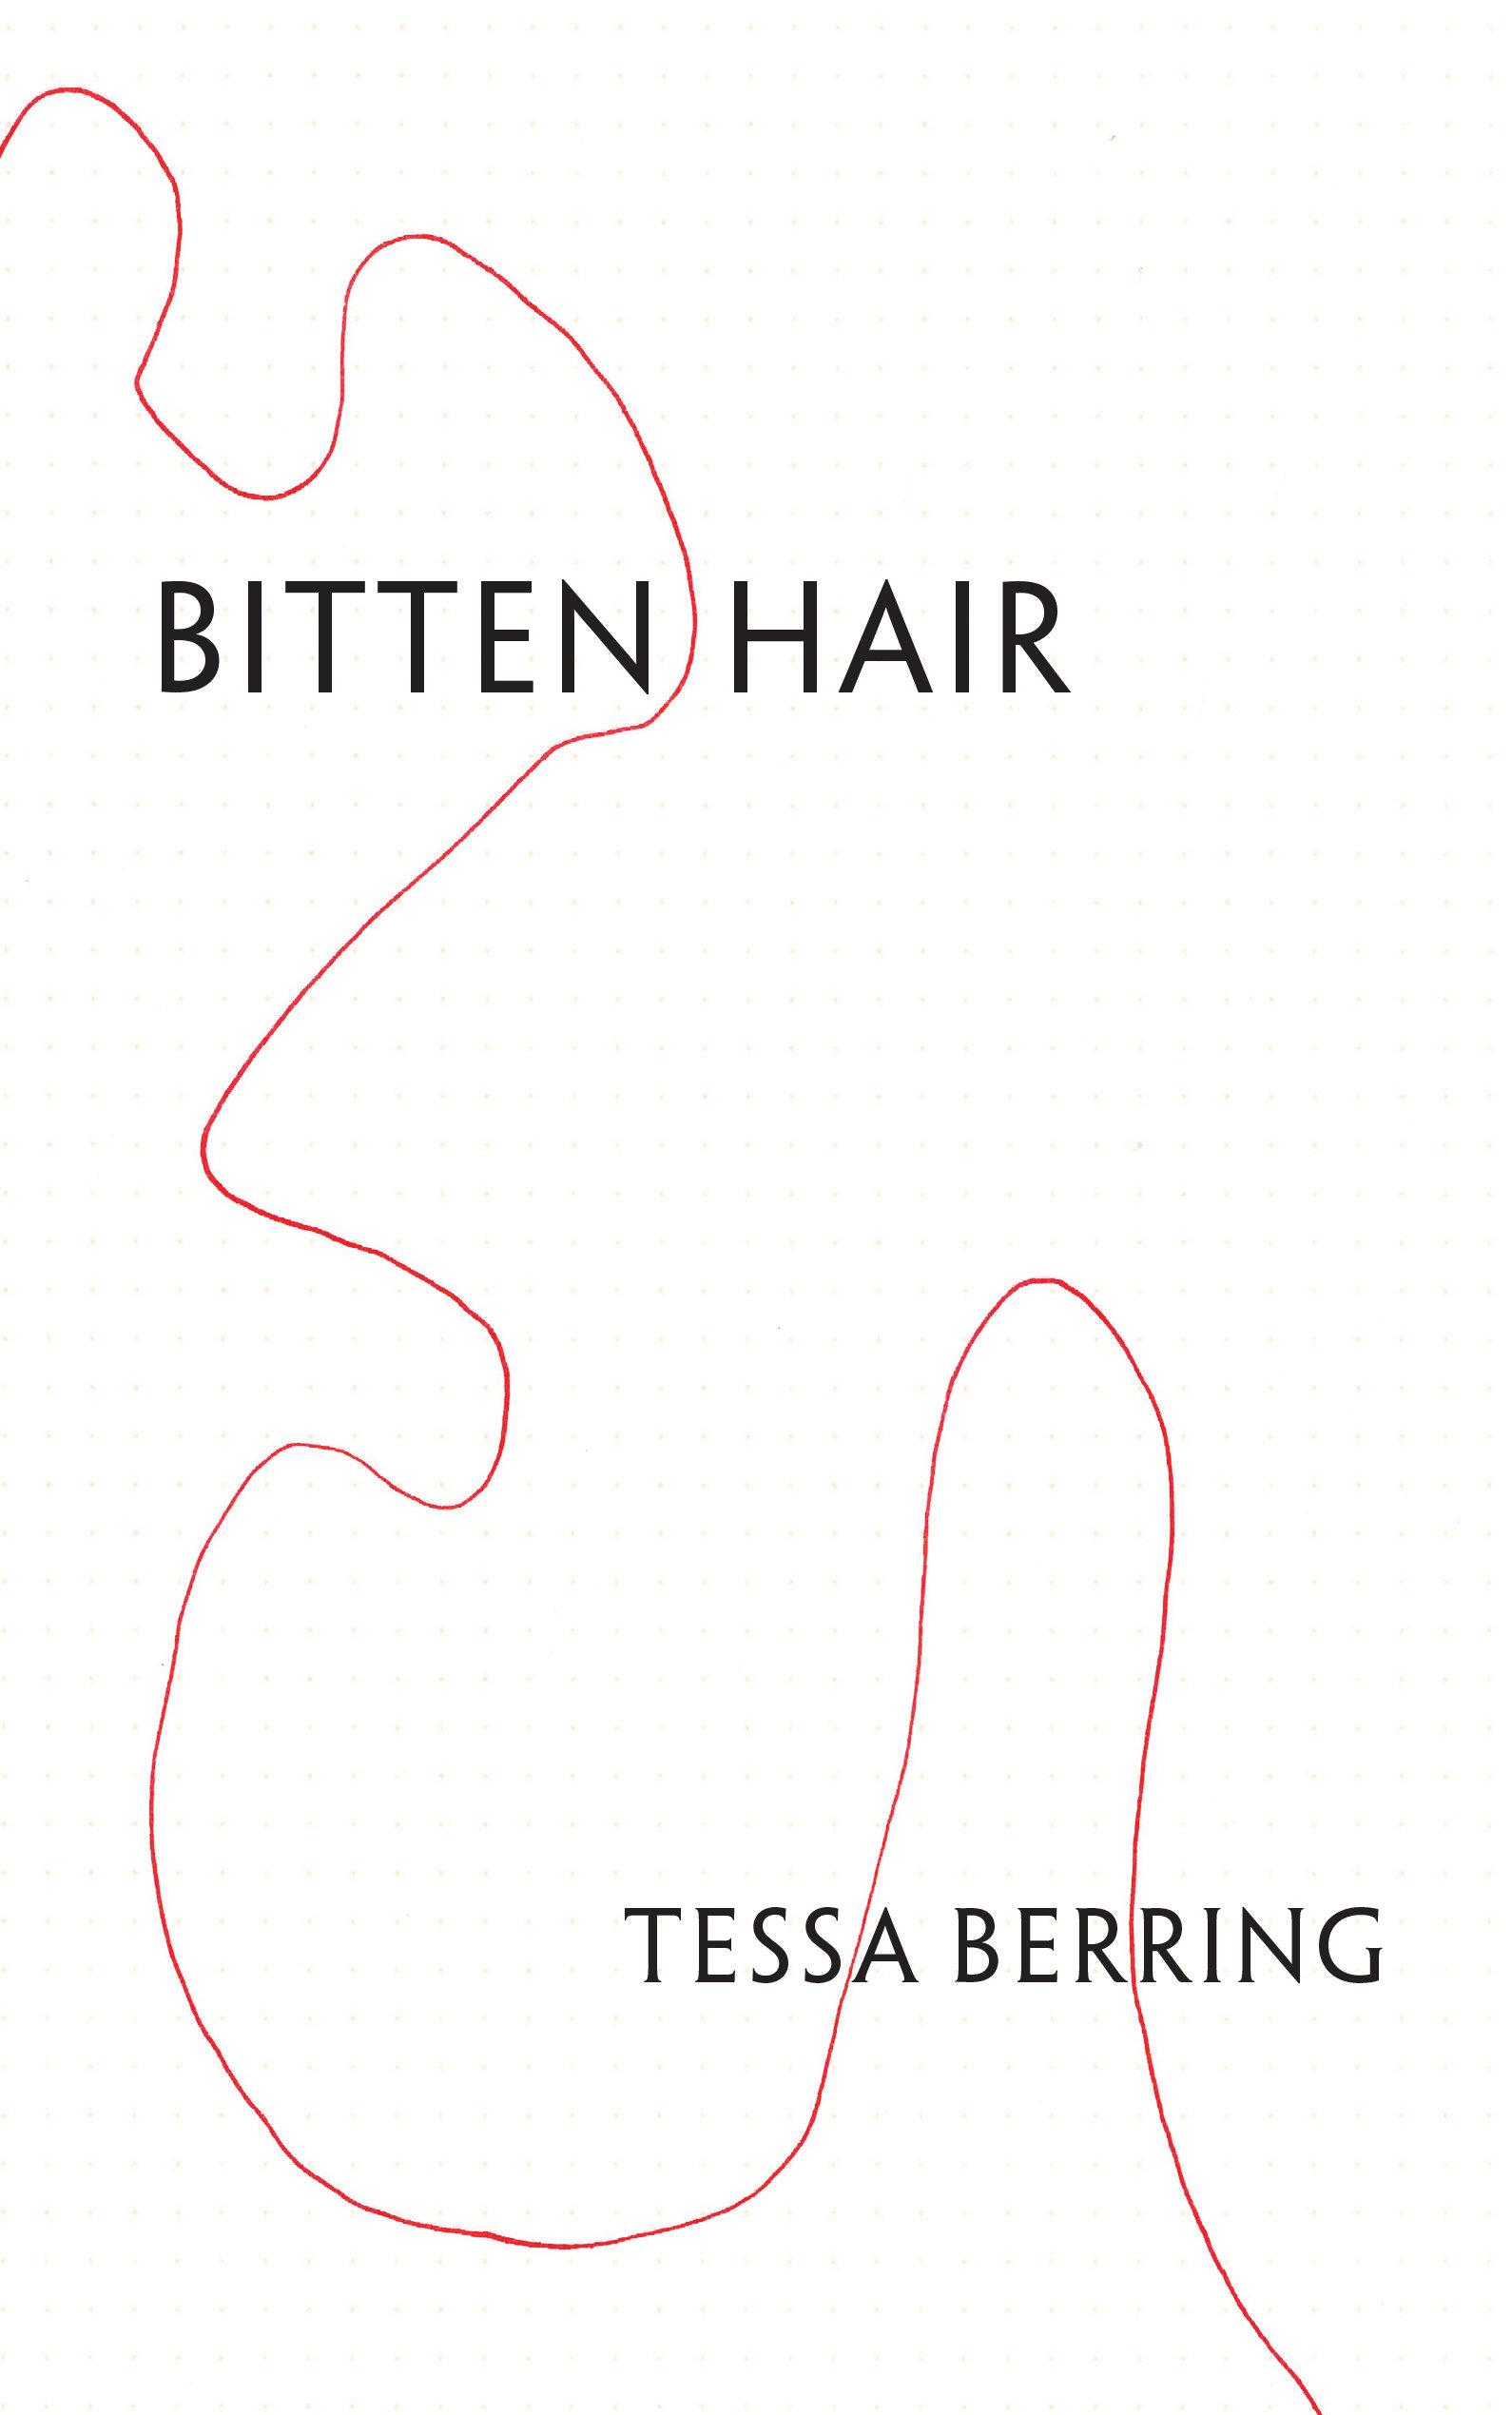 Tessa Berring